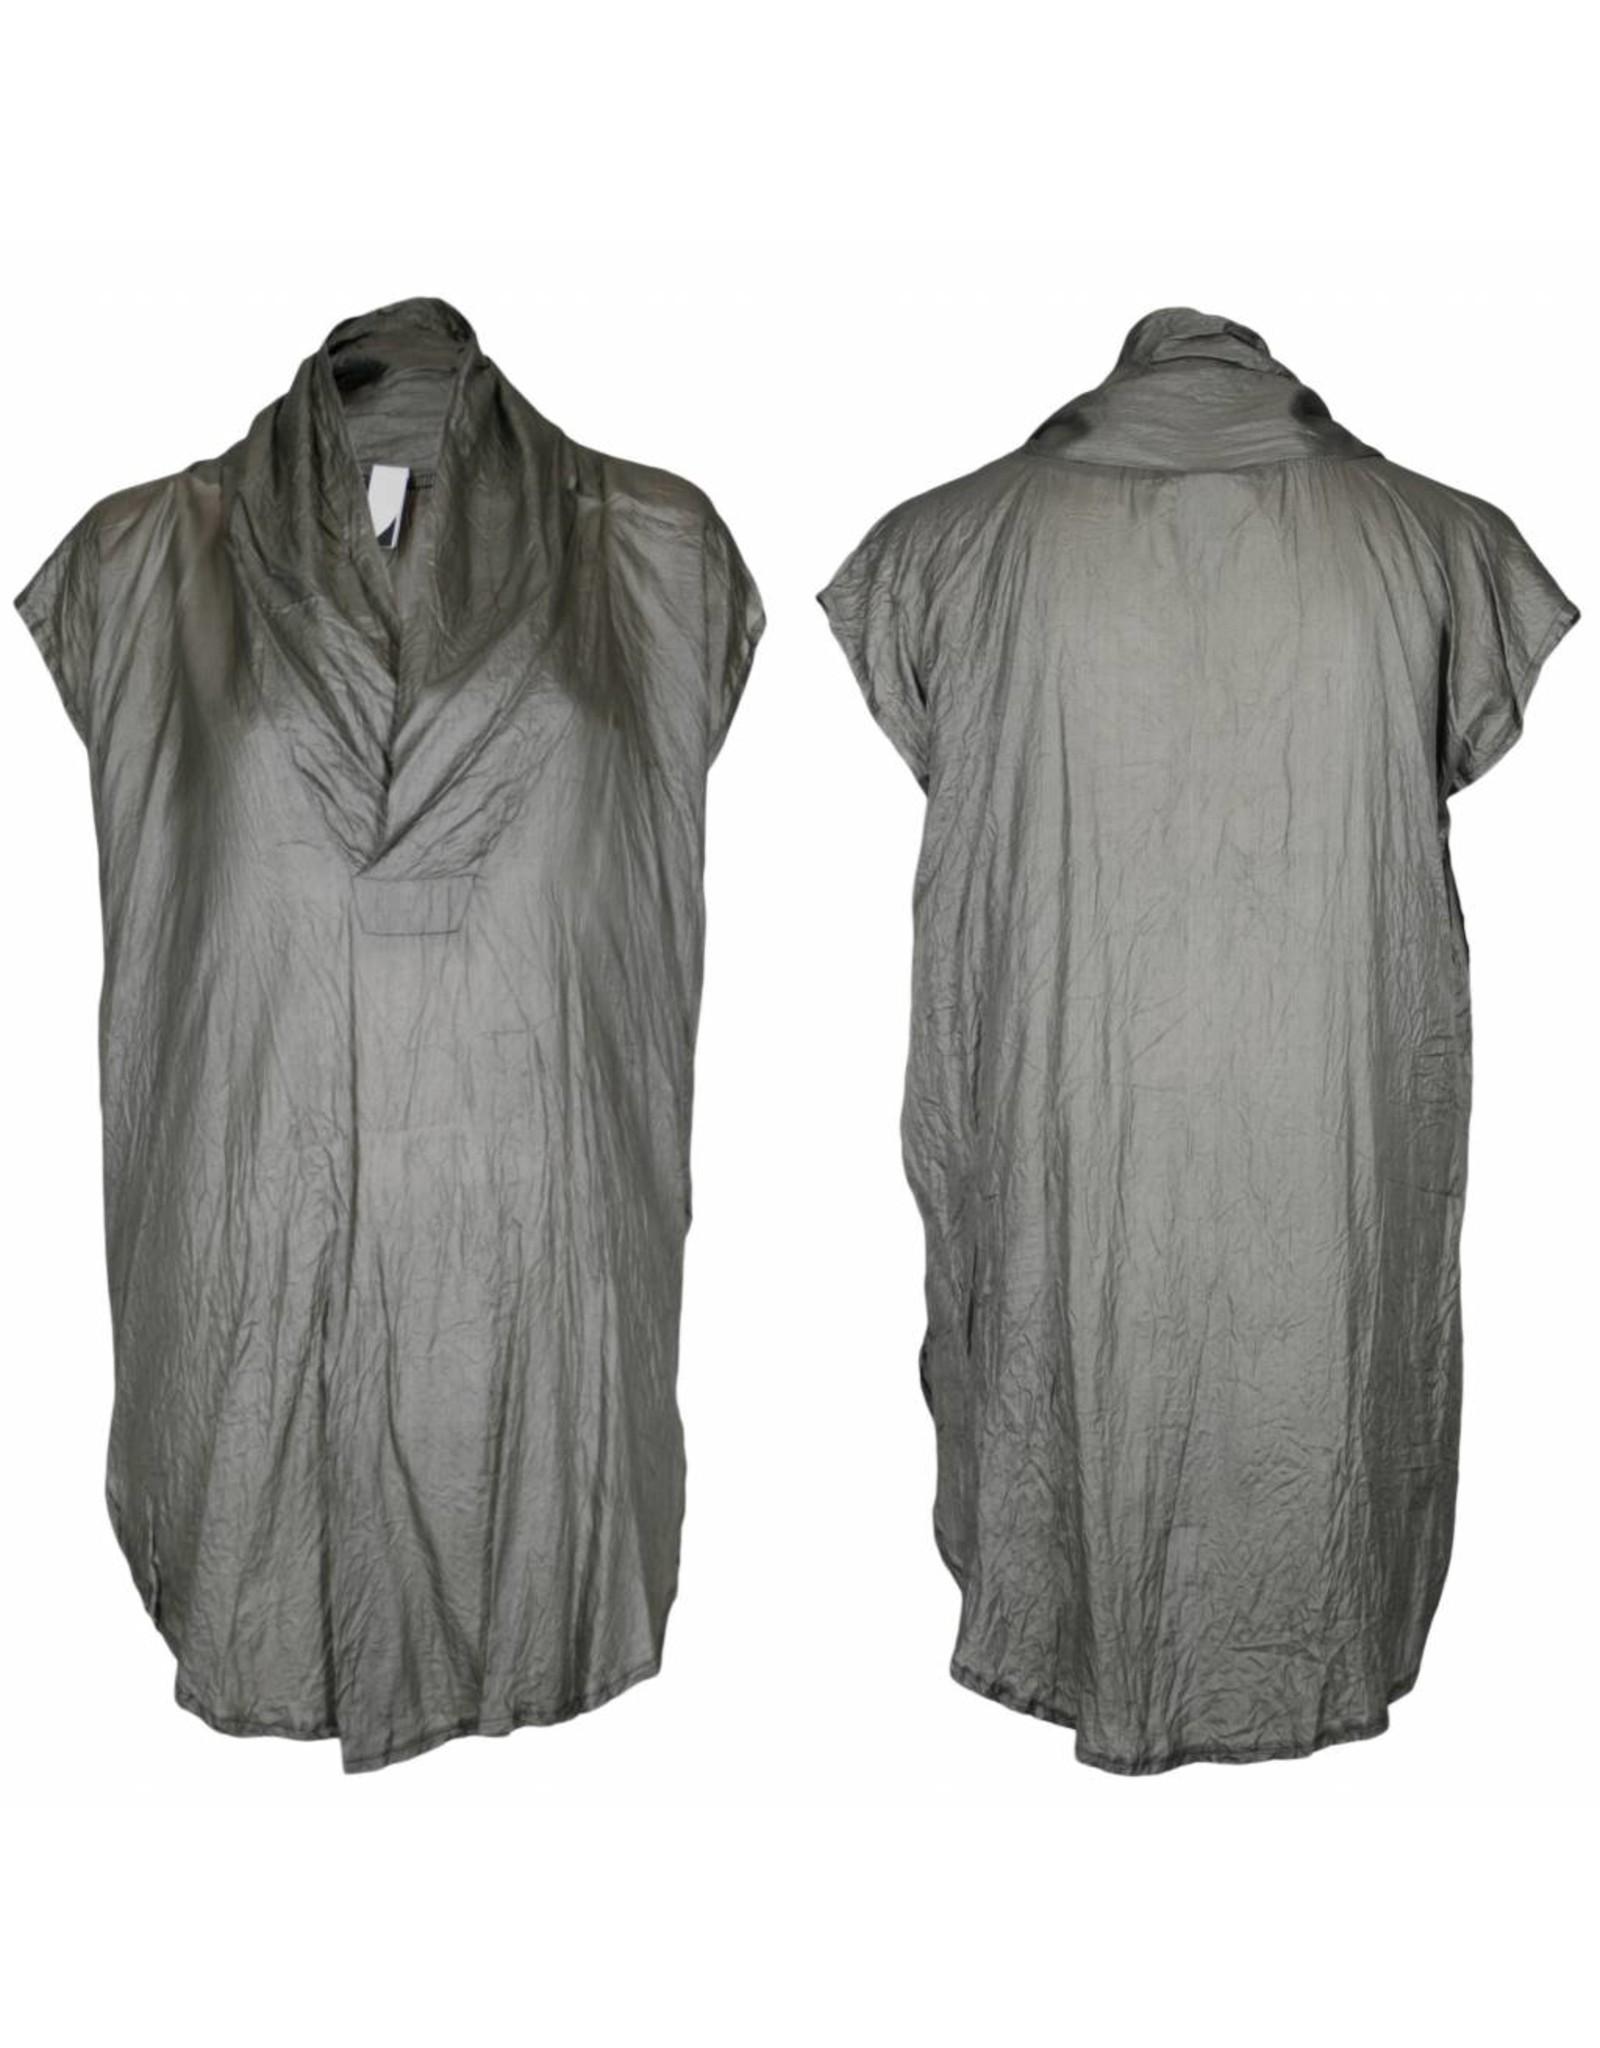 format TOAT dressblouse, ahimsa, silver black L